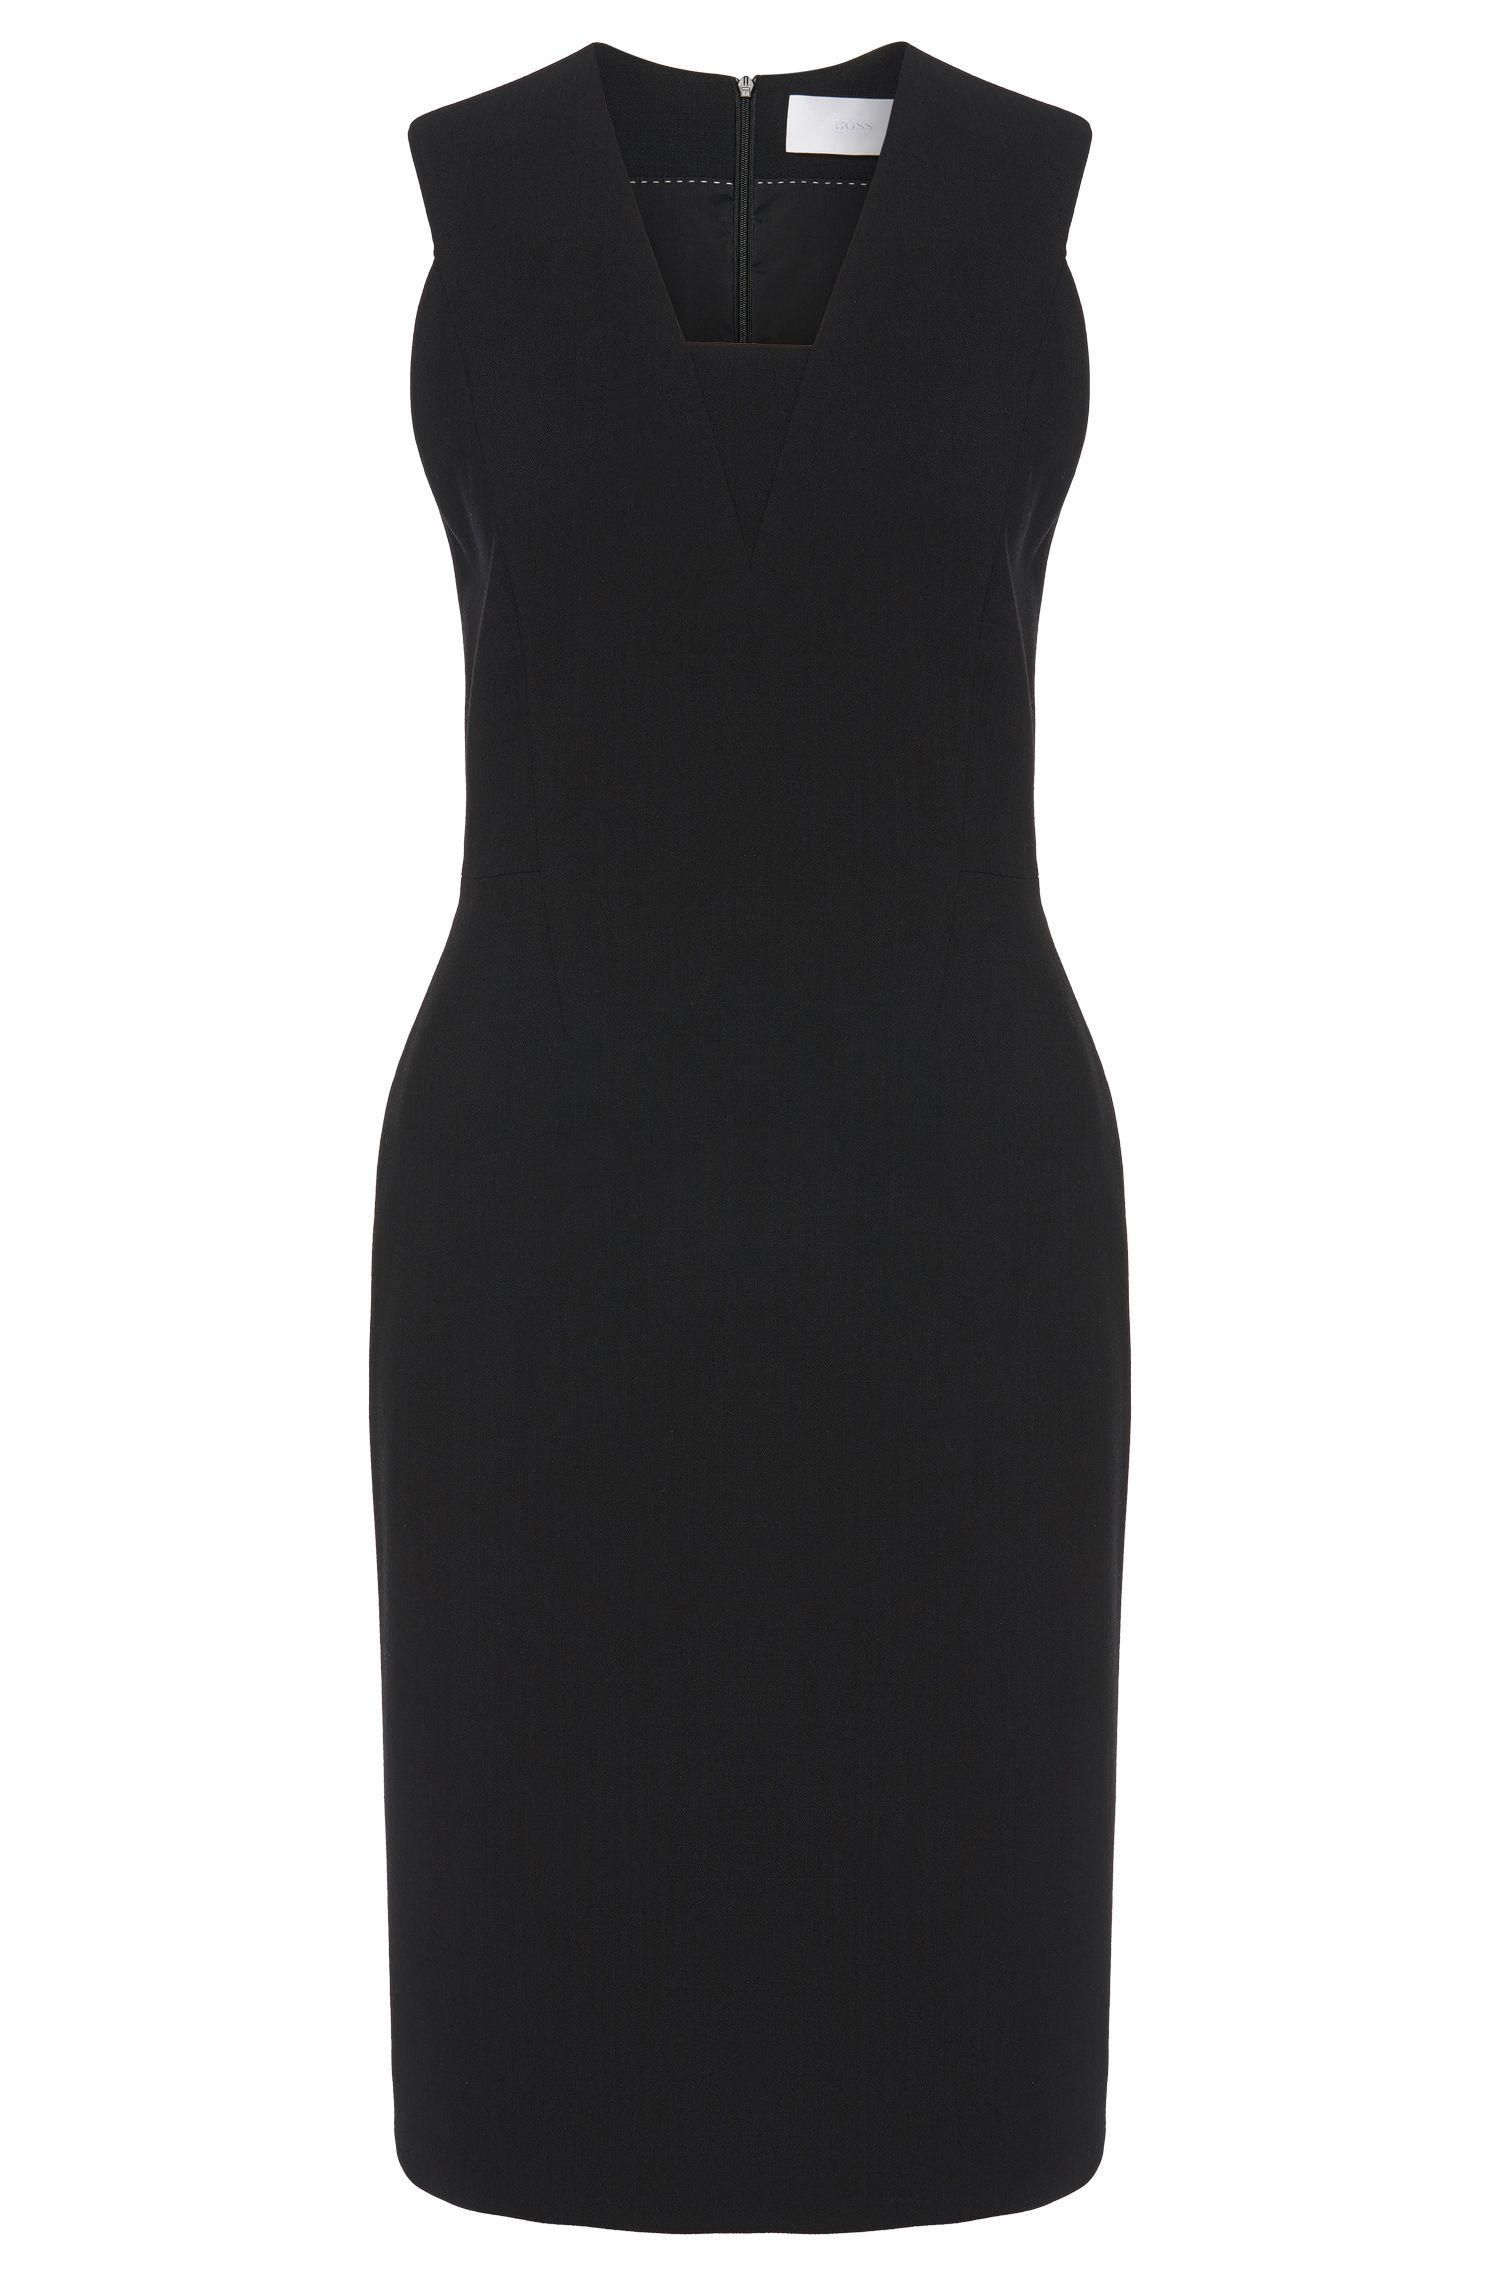 'Duenasina' | Stretch Virgin Wool  Herringbone Sheath Dress